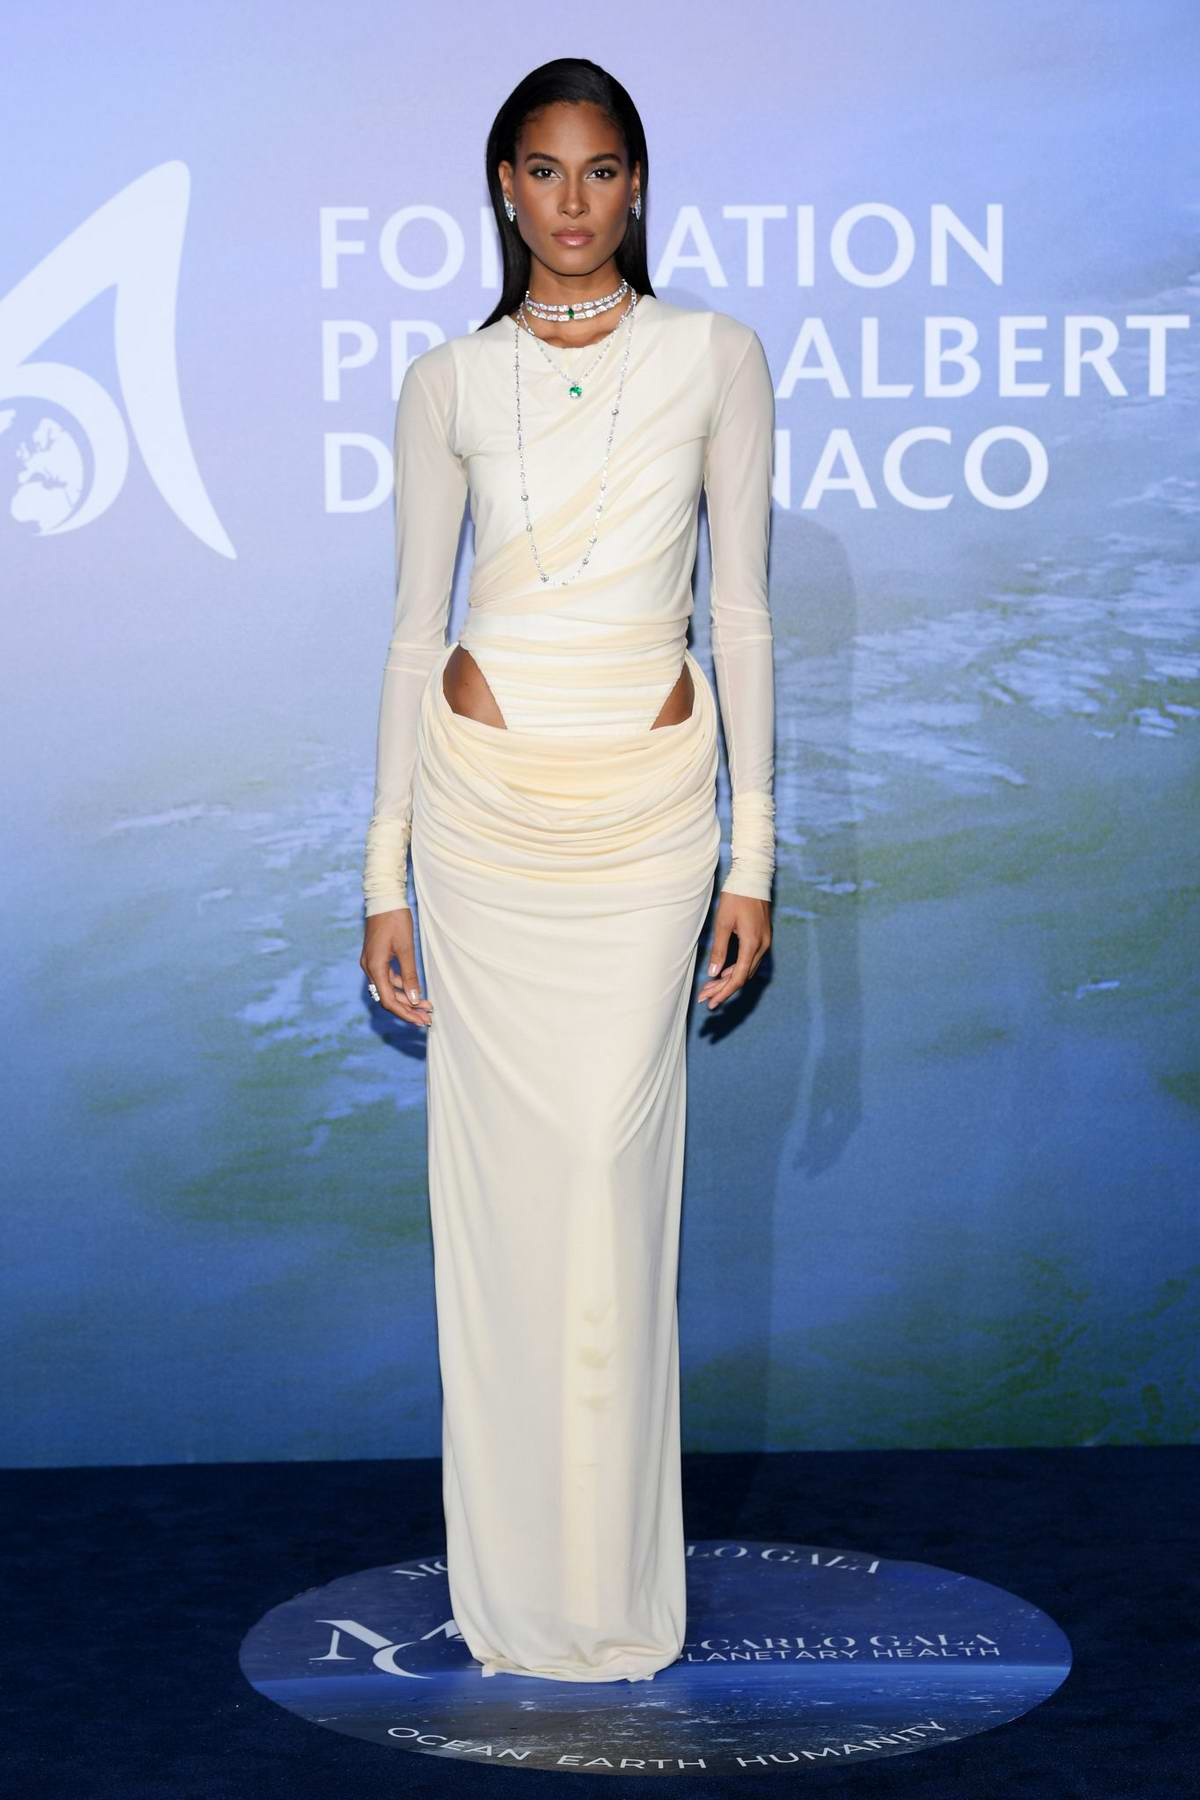 Cindy Bruna attends the Monte Carlo Gala For Planetary Health in Monte Carlo, Monaco